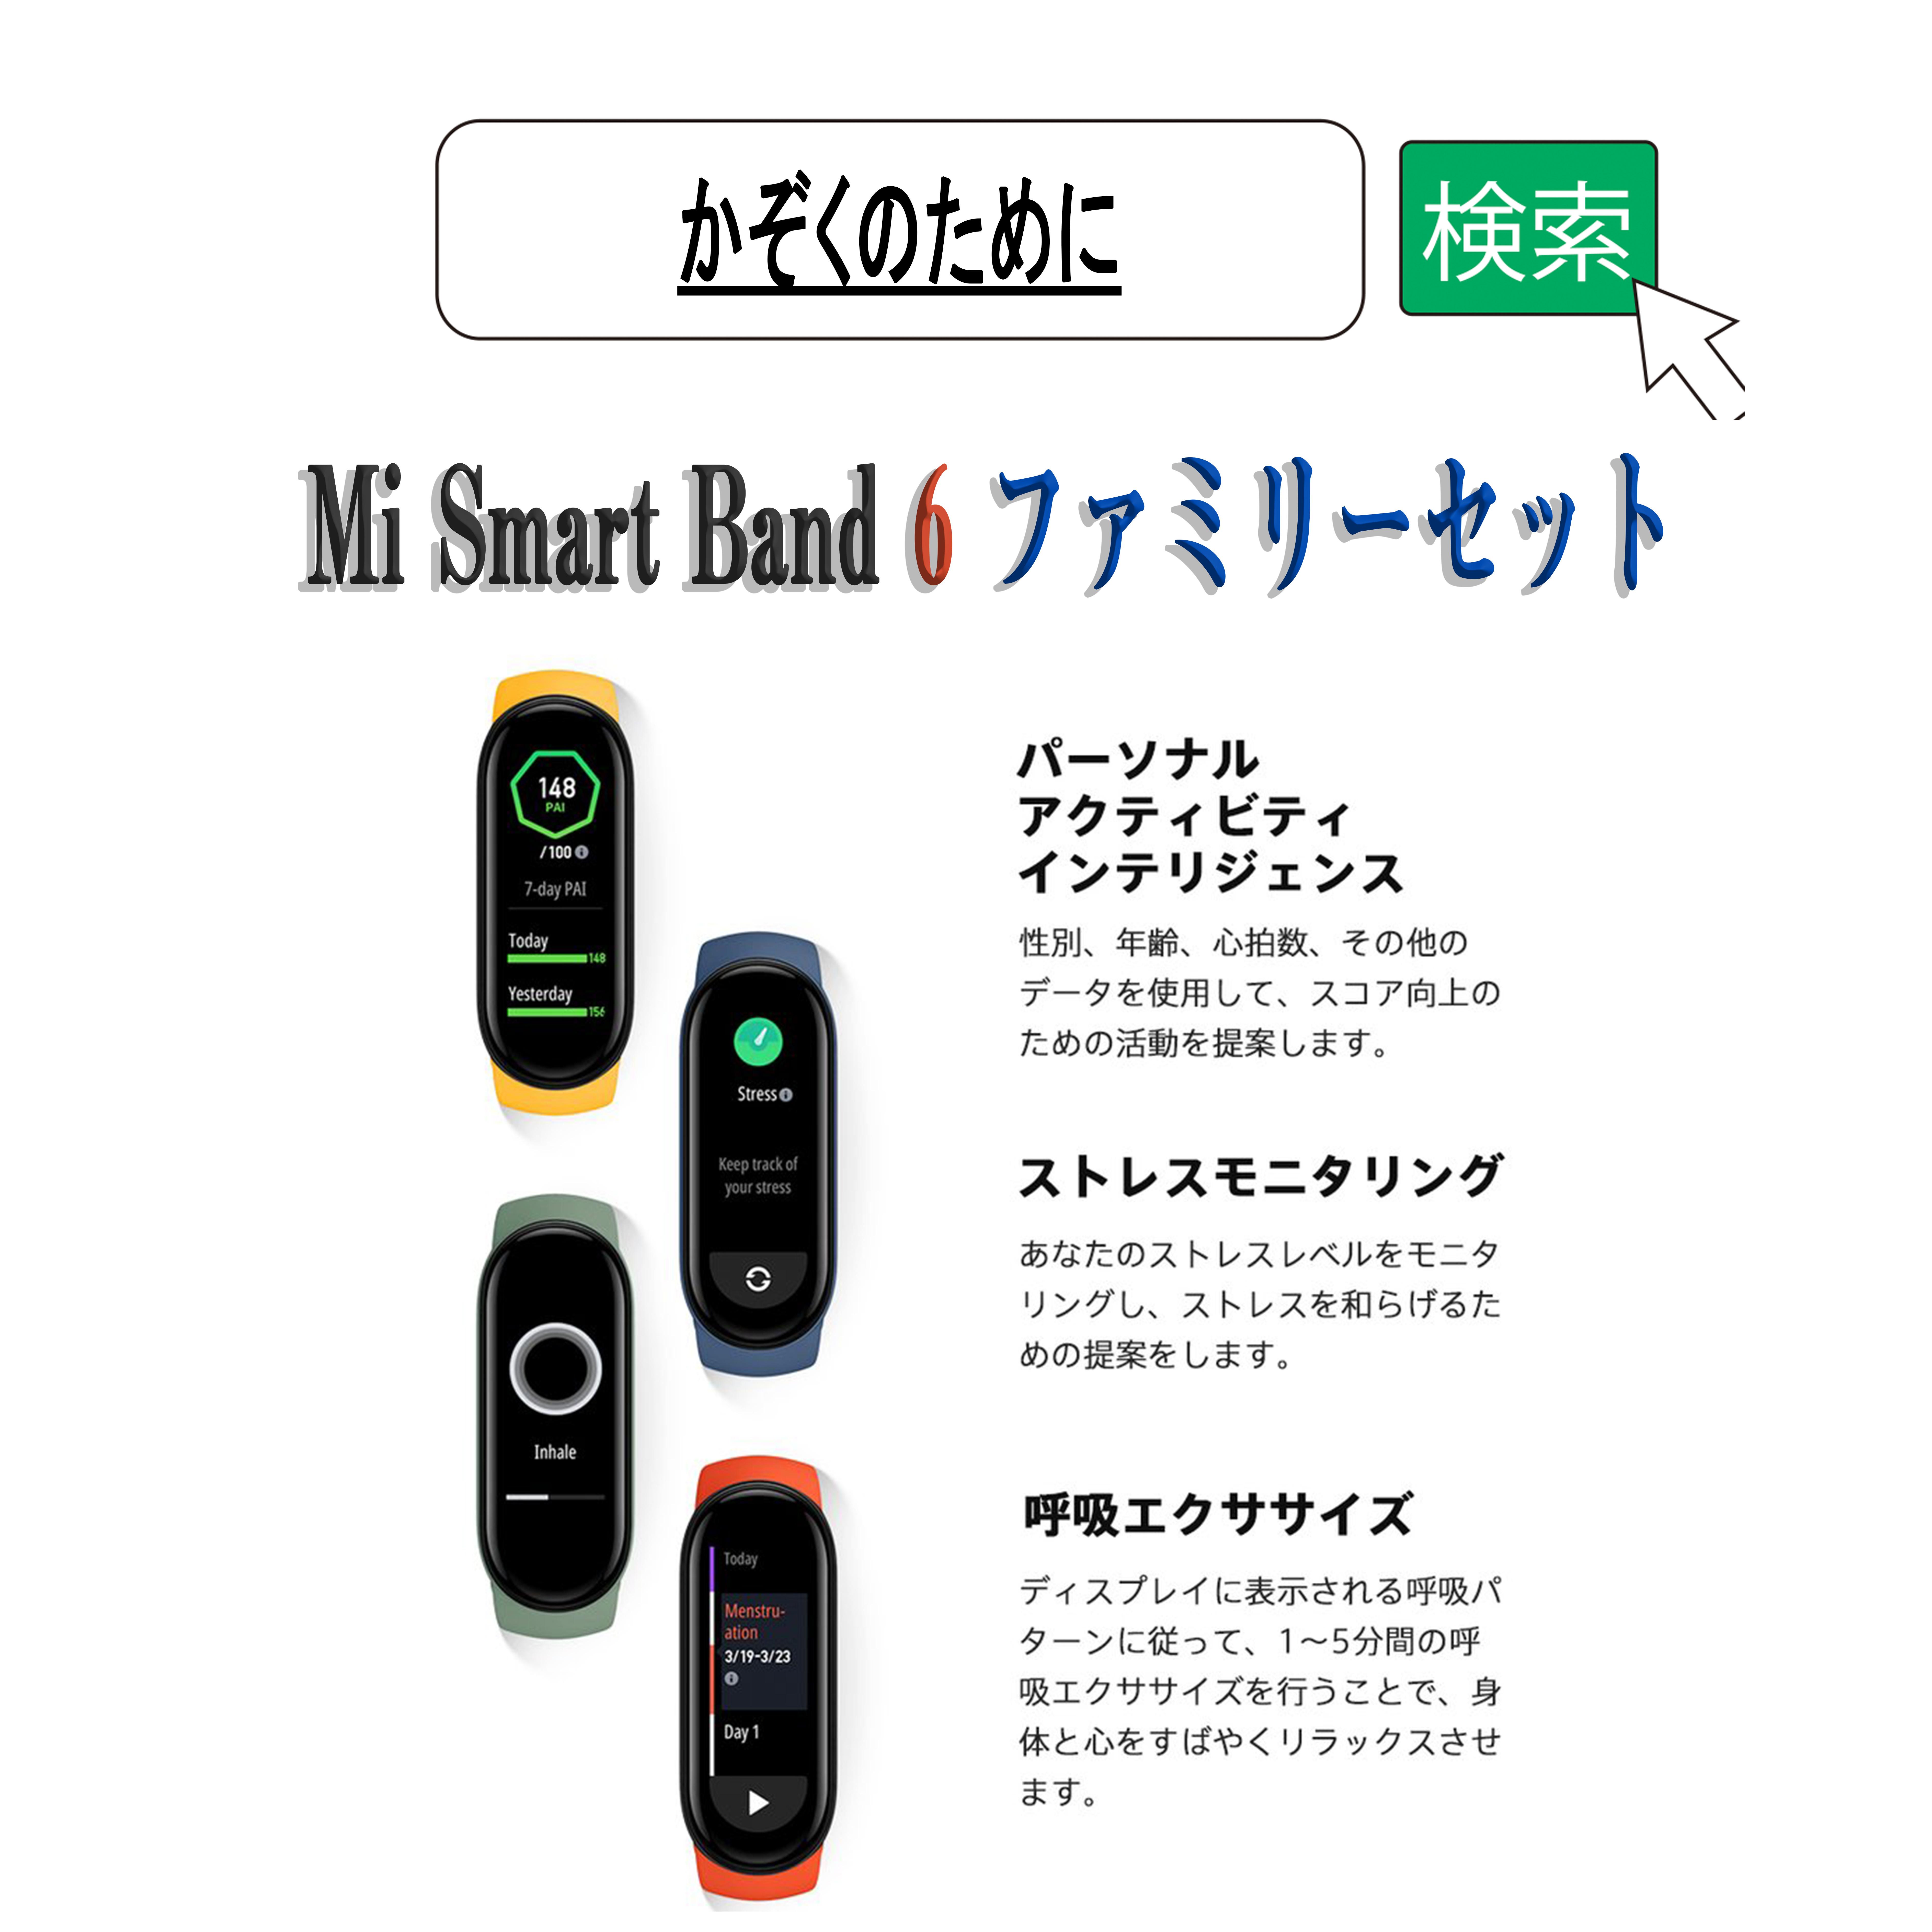 【Xiaomi Mi スマートバンド 6 グローバル版】 ファミリーセット (4 pcs)